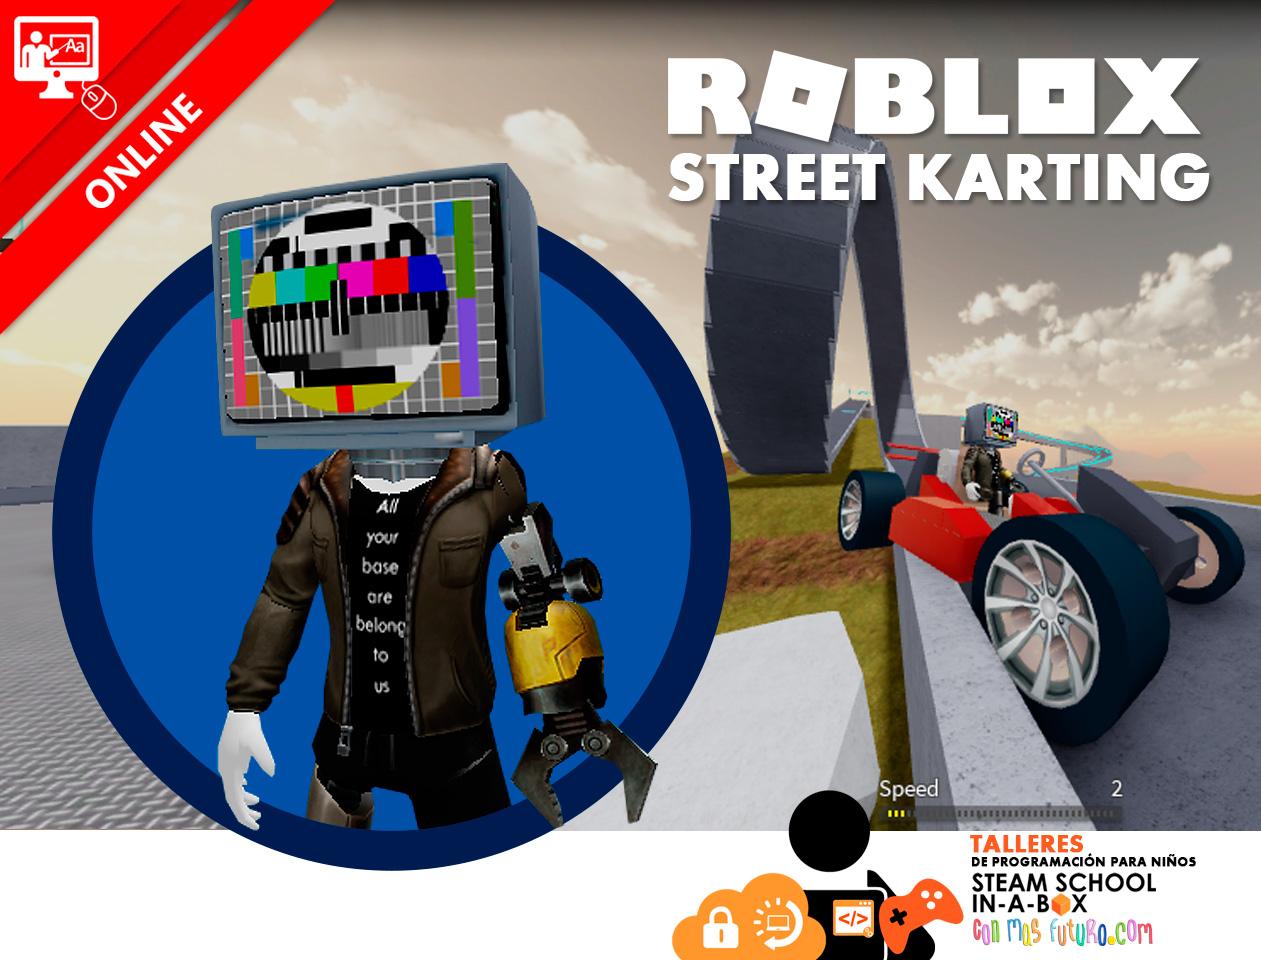 ROBLOX STREET KARTING